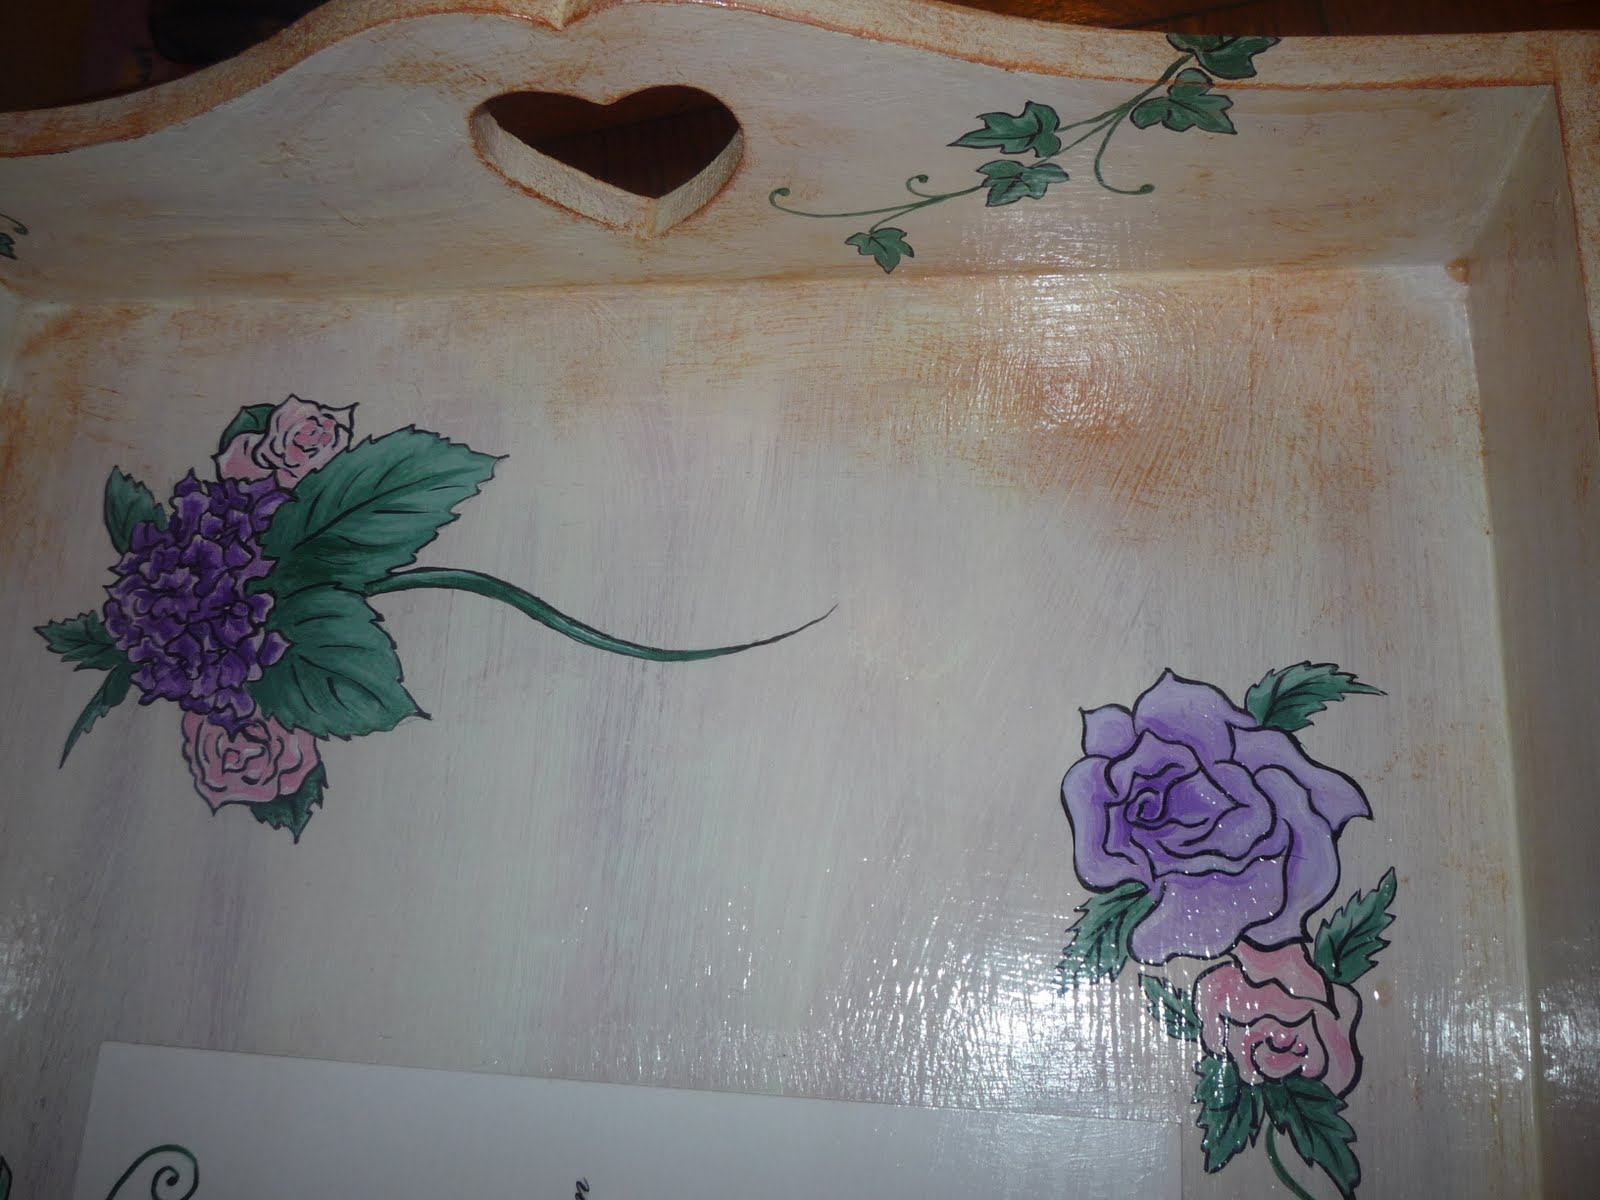 11 Wedding Anniversary Gift Ideas: Http://Art4every1.blogspot.com: Wedding Anniversary Gift